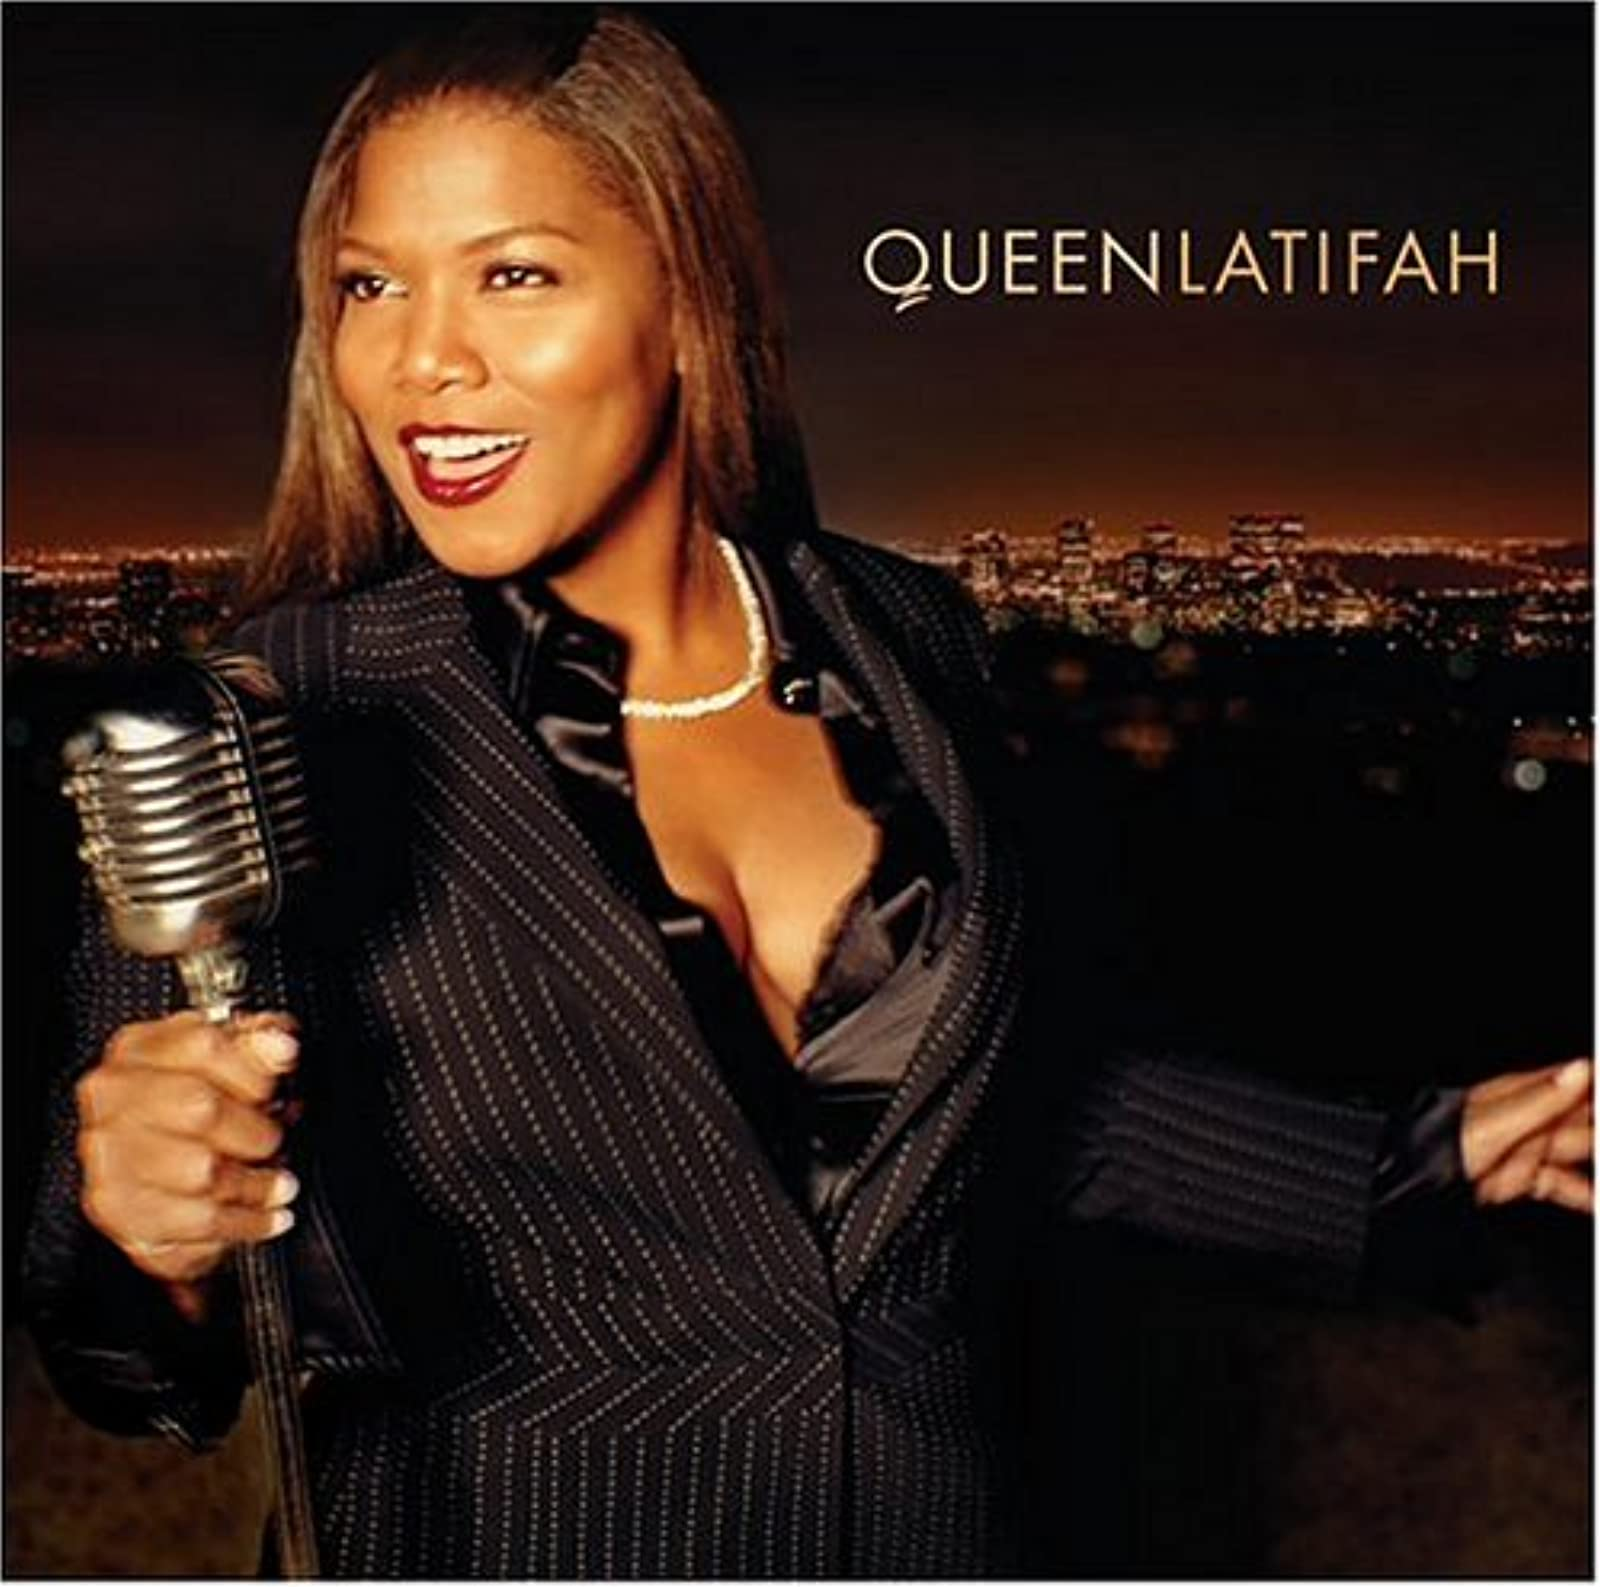 The Dana Owens Album By Queen Latifah On Audio CD 2004